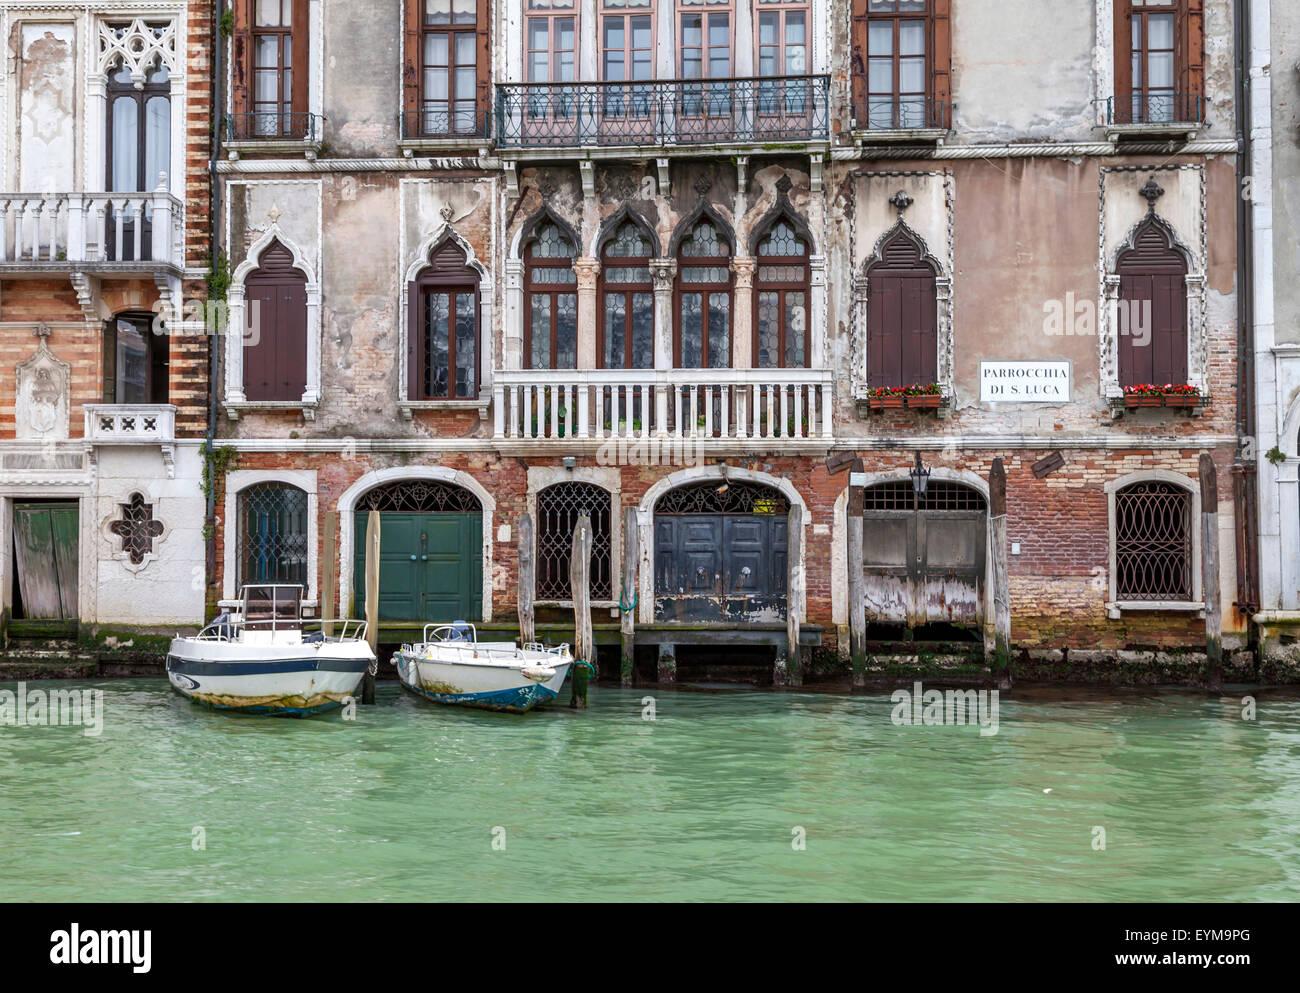 Am Canale Grande in Venedig - Stock Image